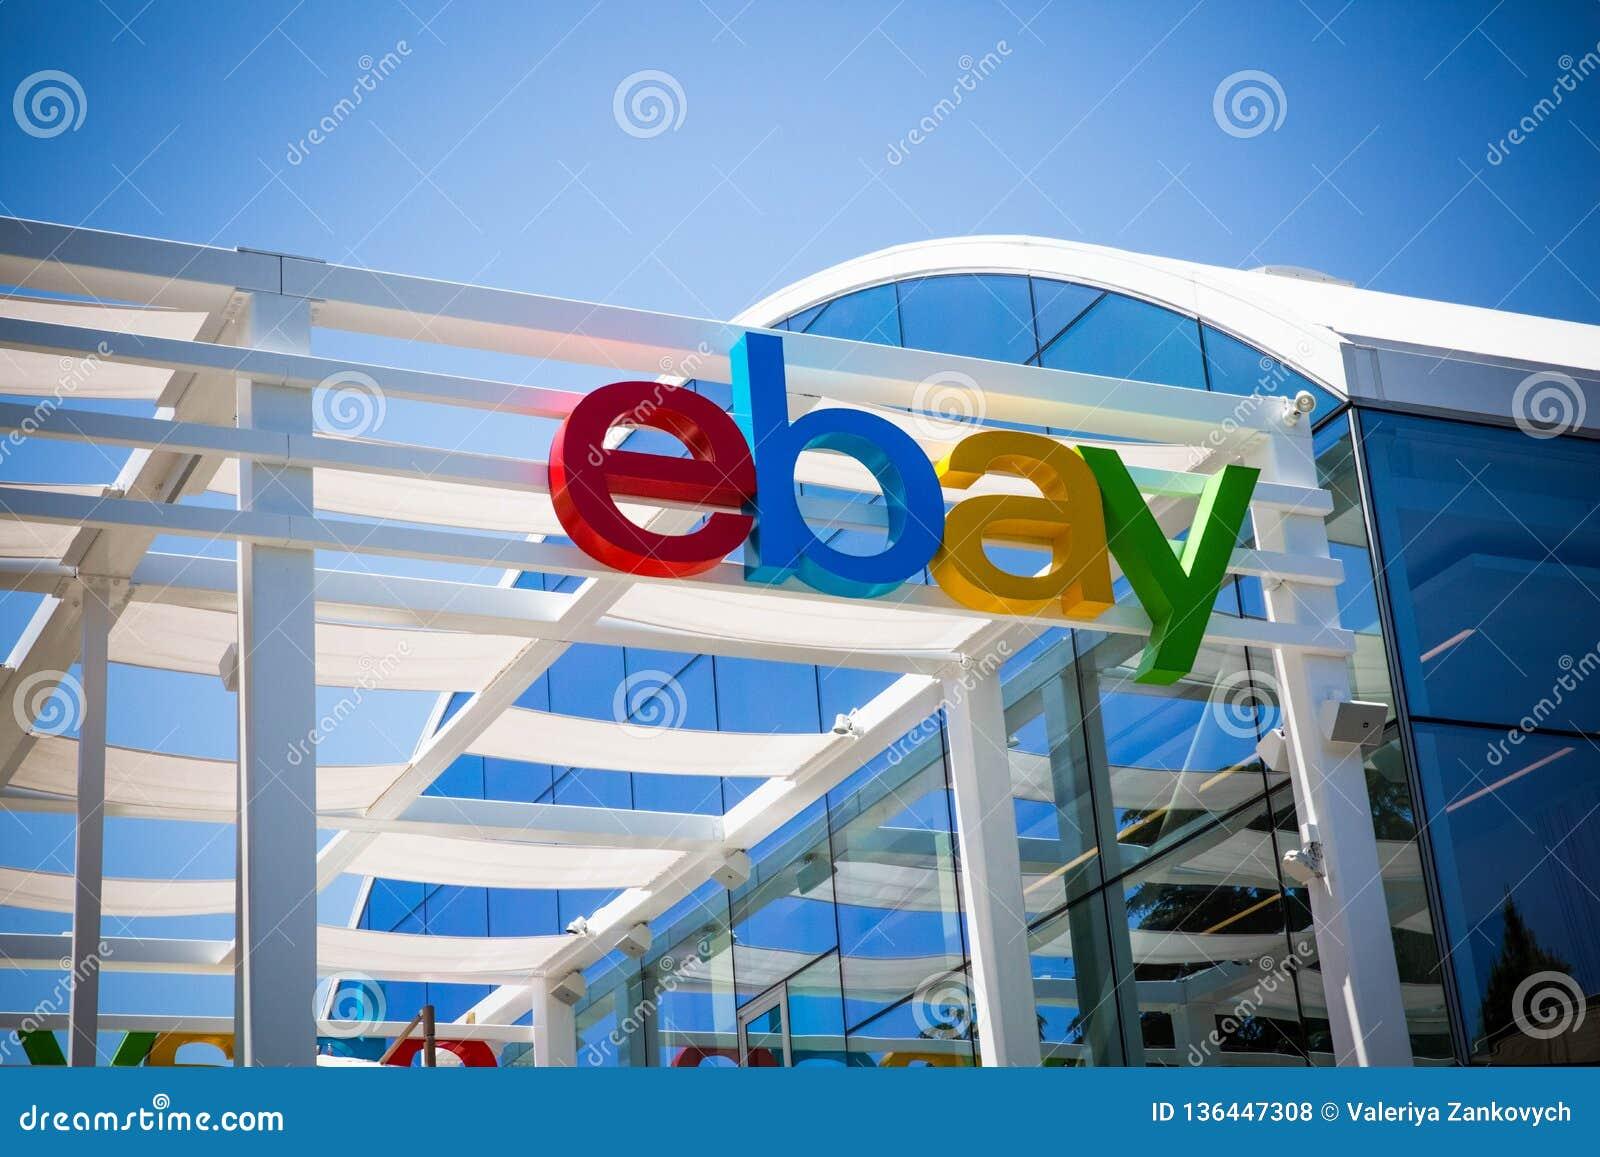 San Jose, California, USA - May 21, 2018: EBay`s